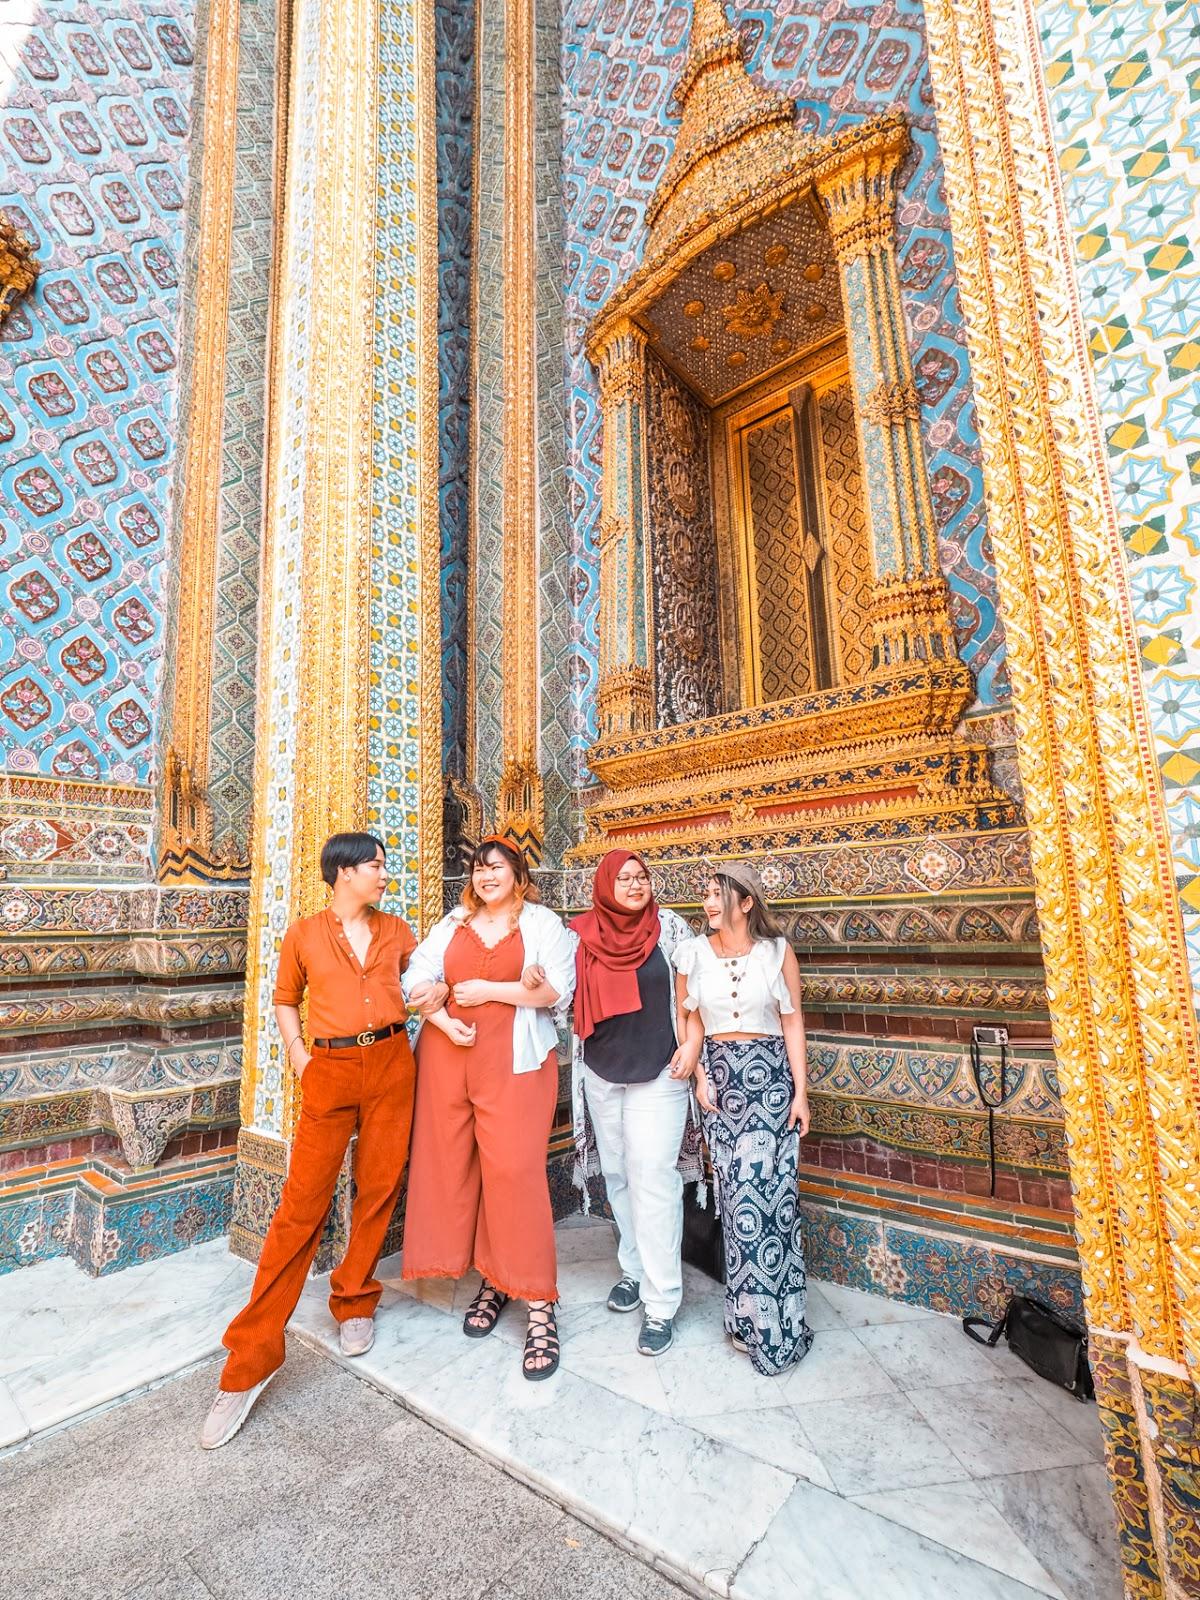 Visiting Wat Phra Keaw